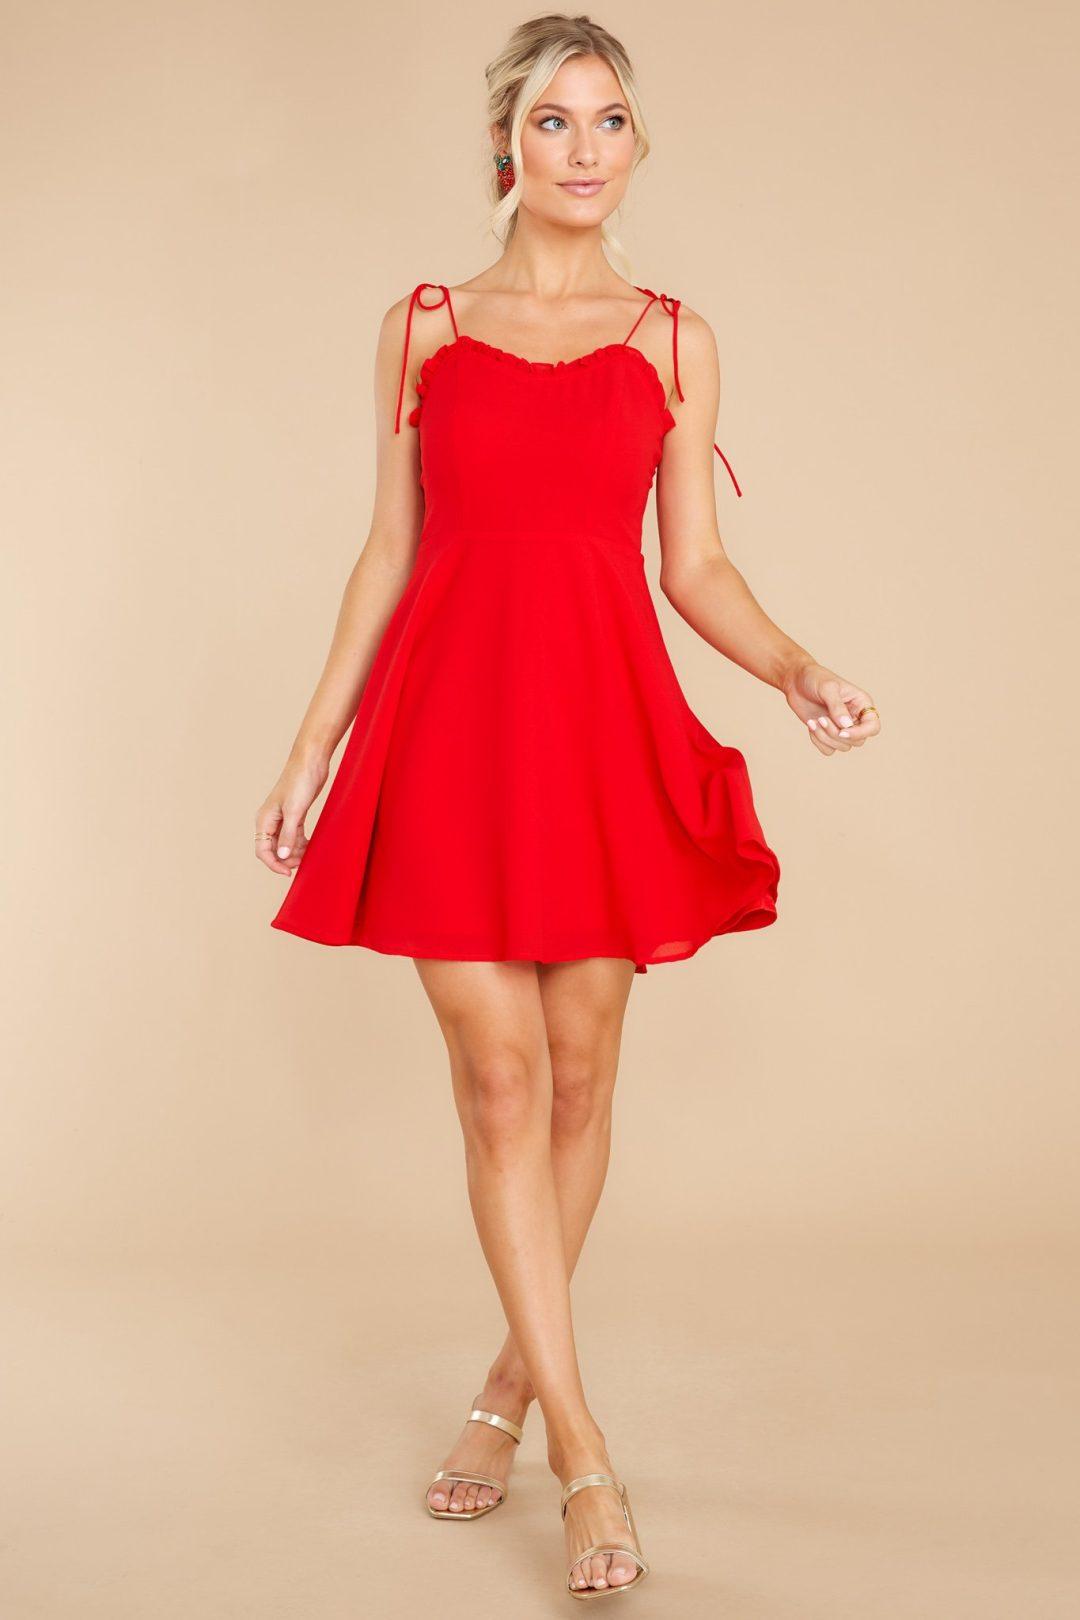 Strappy red dress